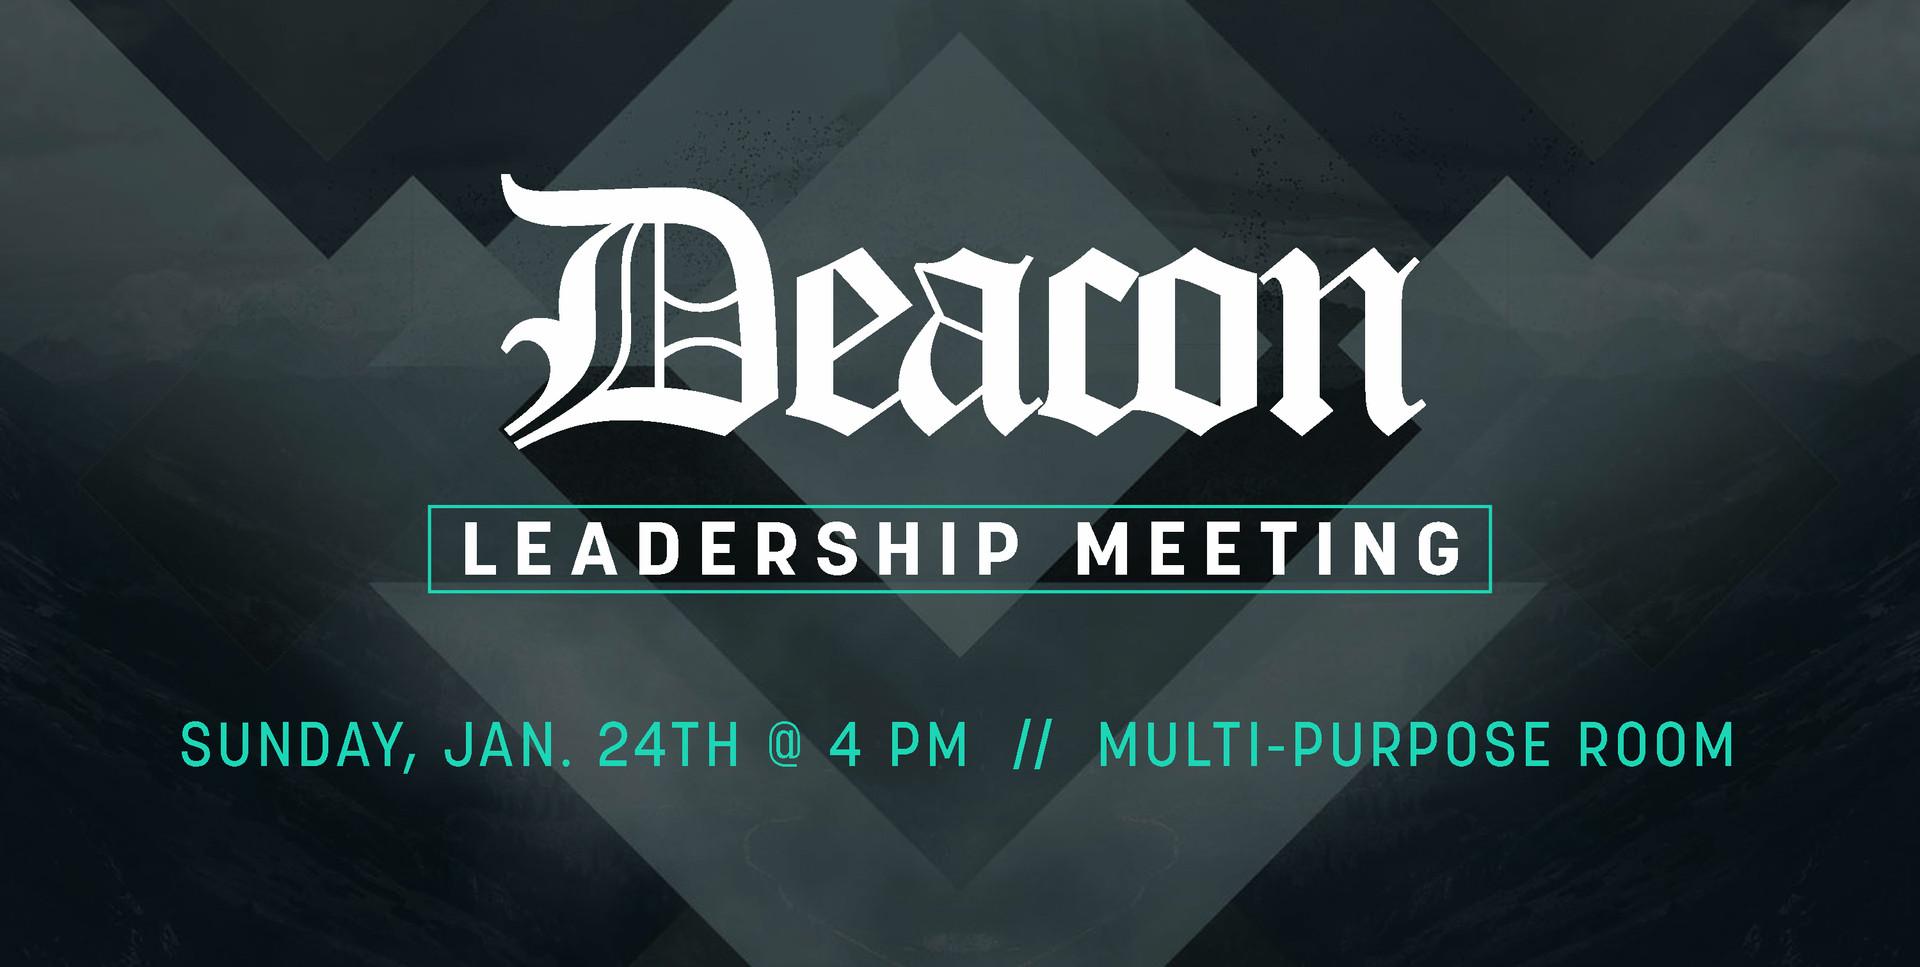 DEACON LEADERSHIP MEETING